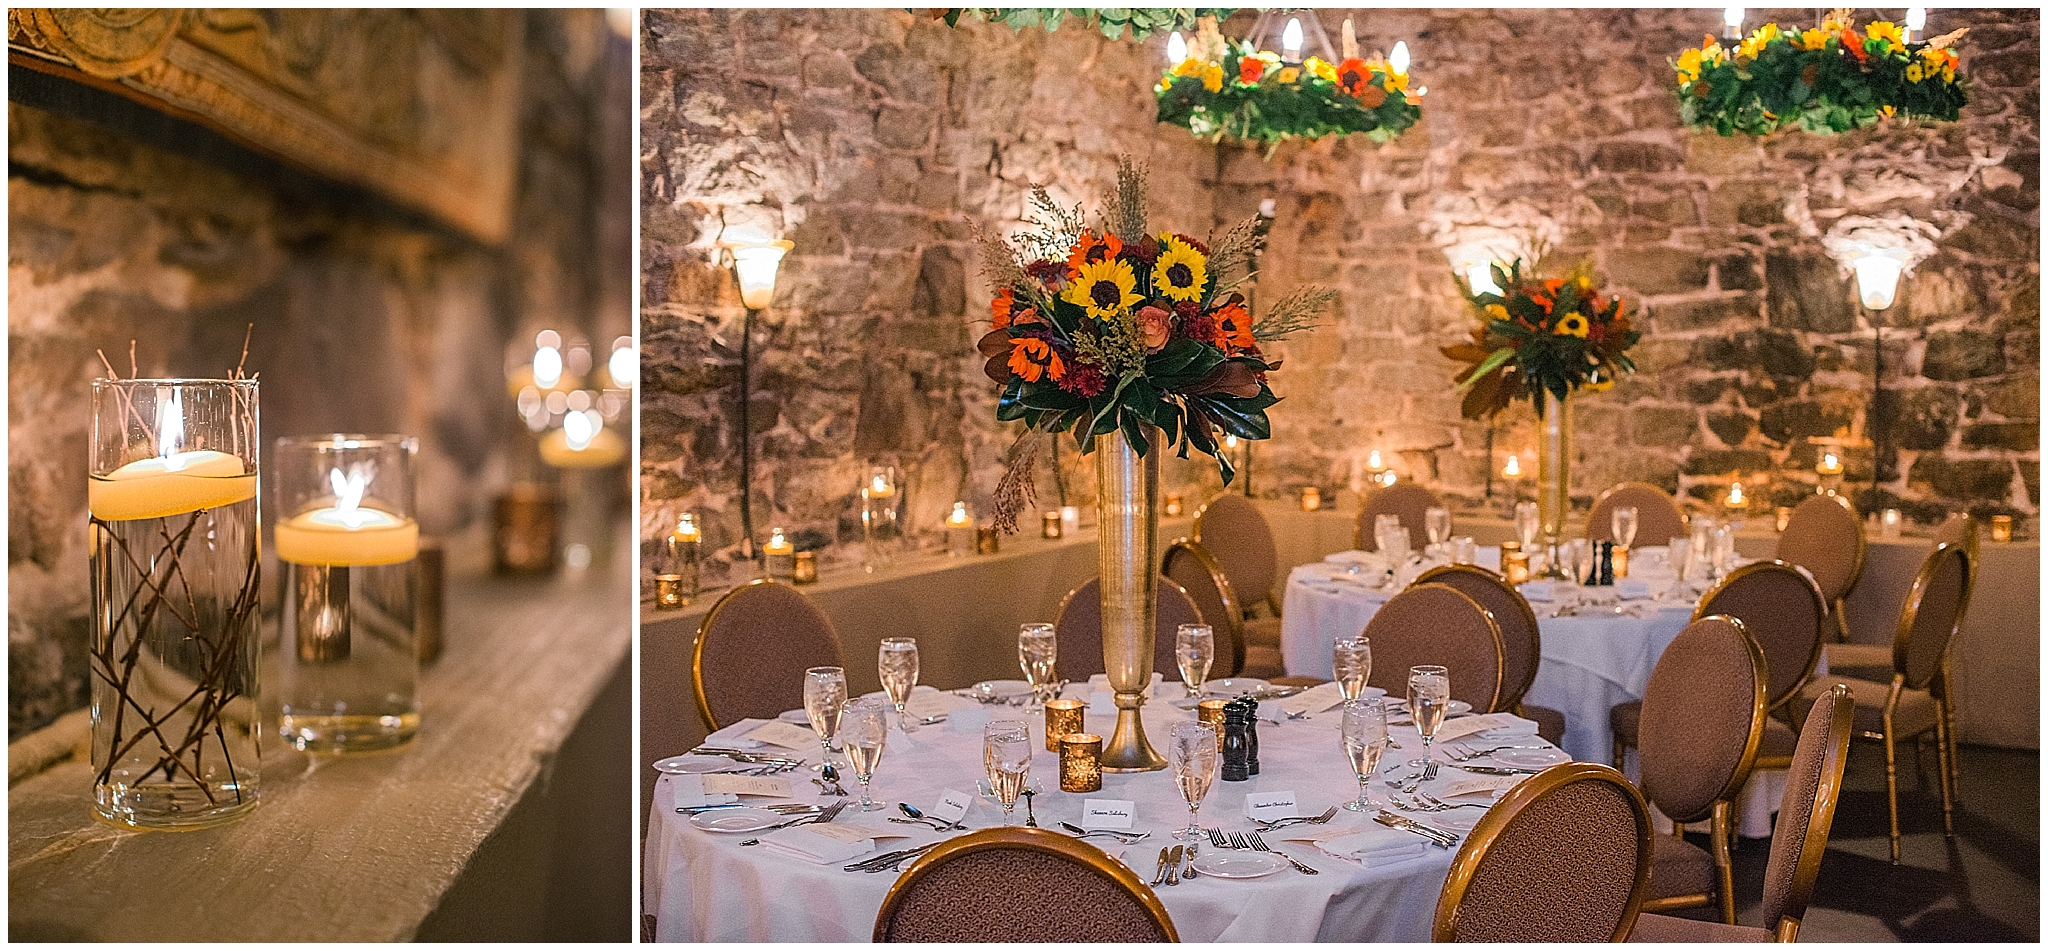 Biltmore_Wedding_Reception_Wine_Cellar_Asheville_Photographer-1.jpg